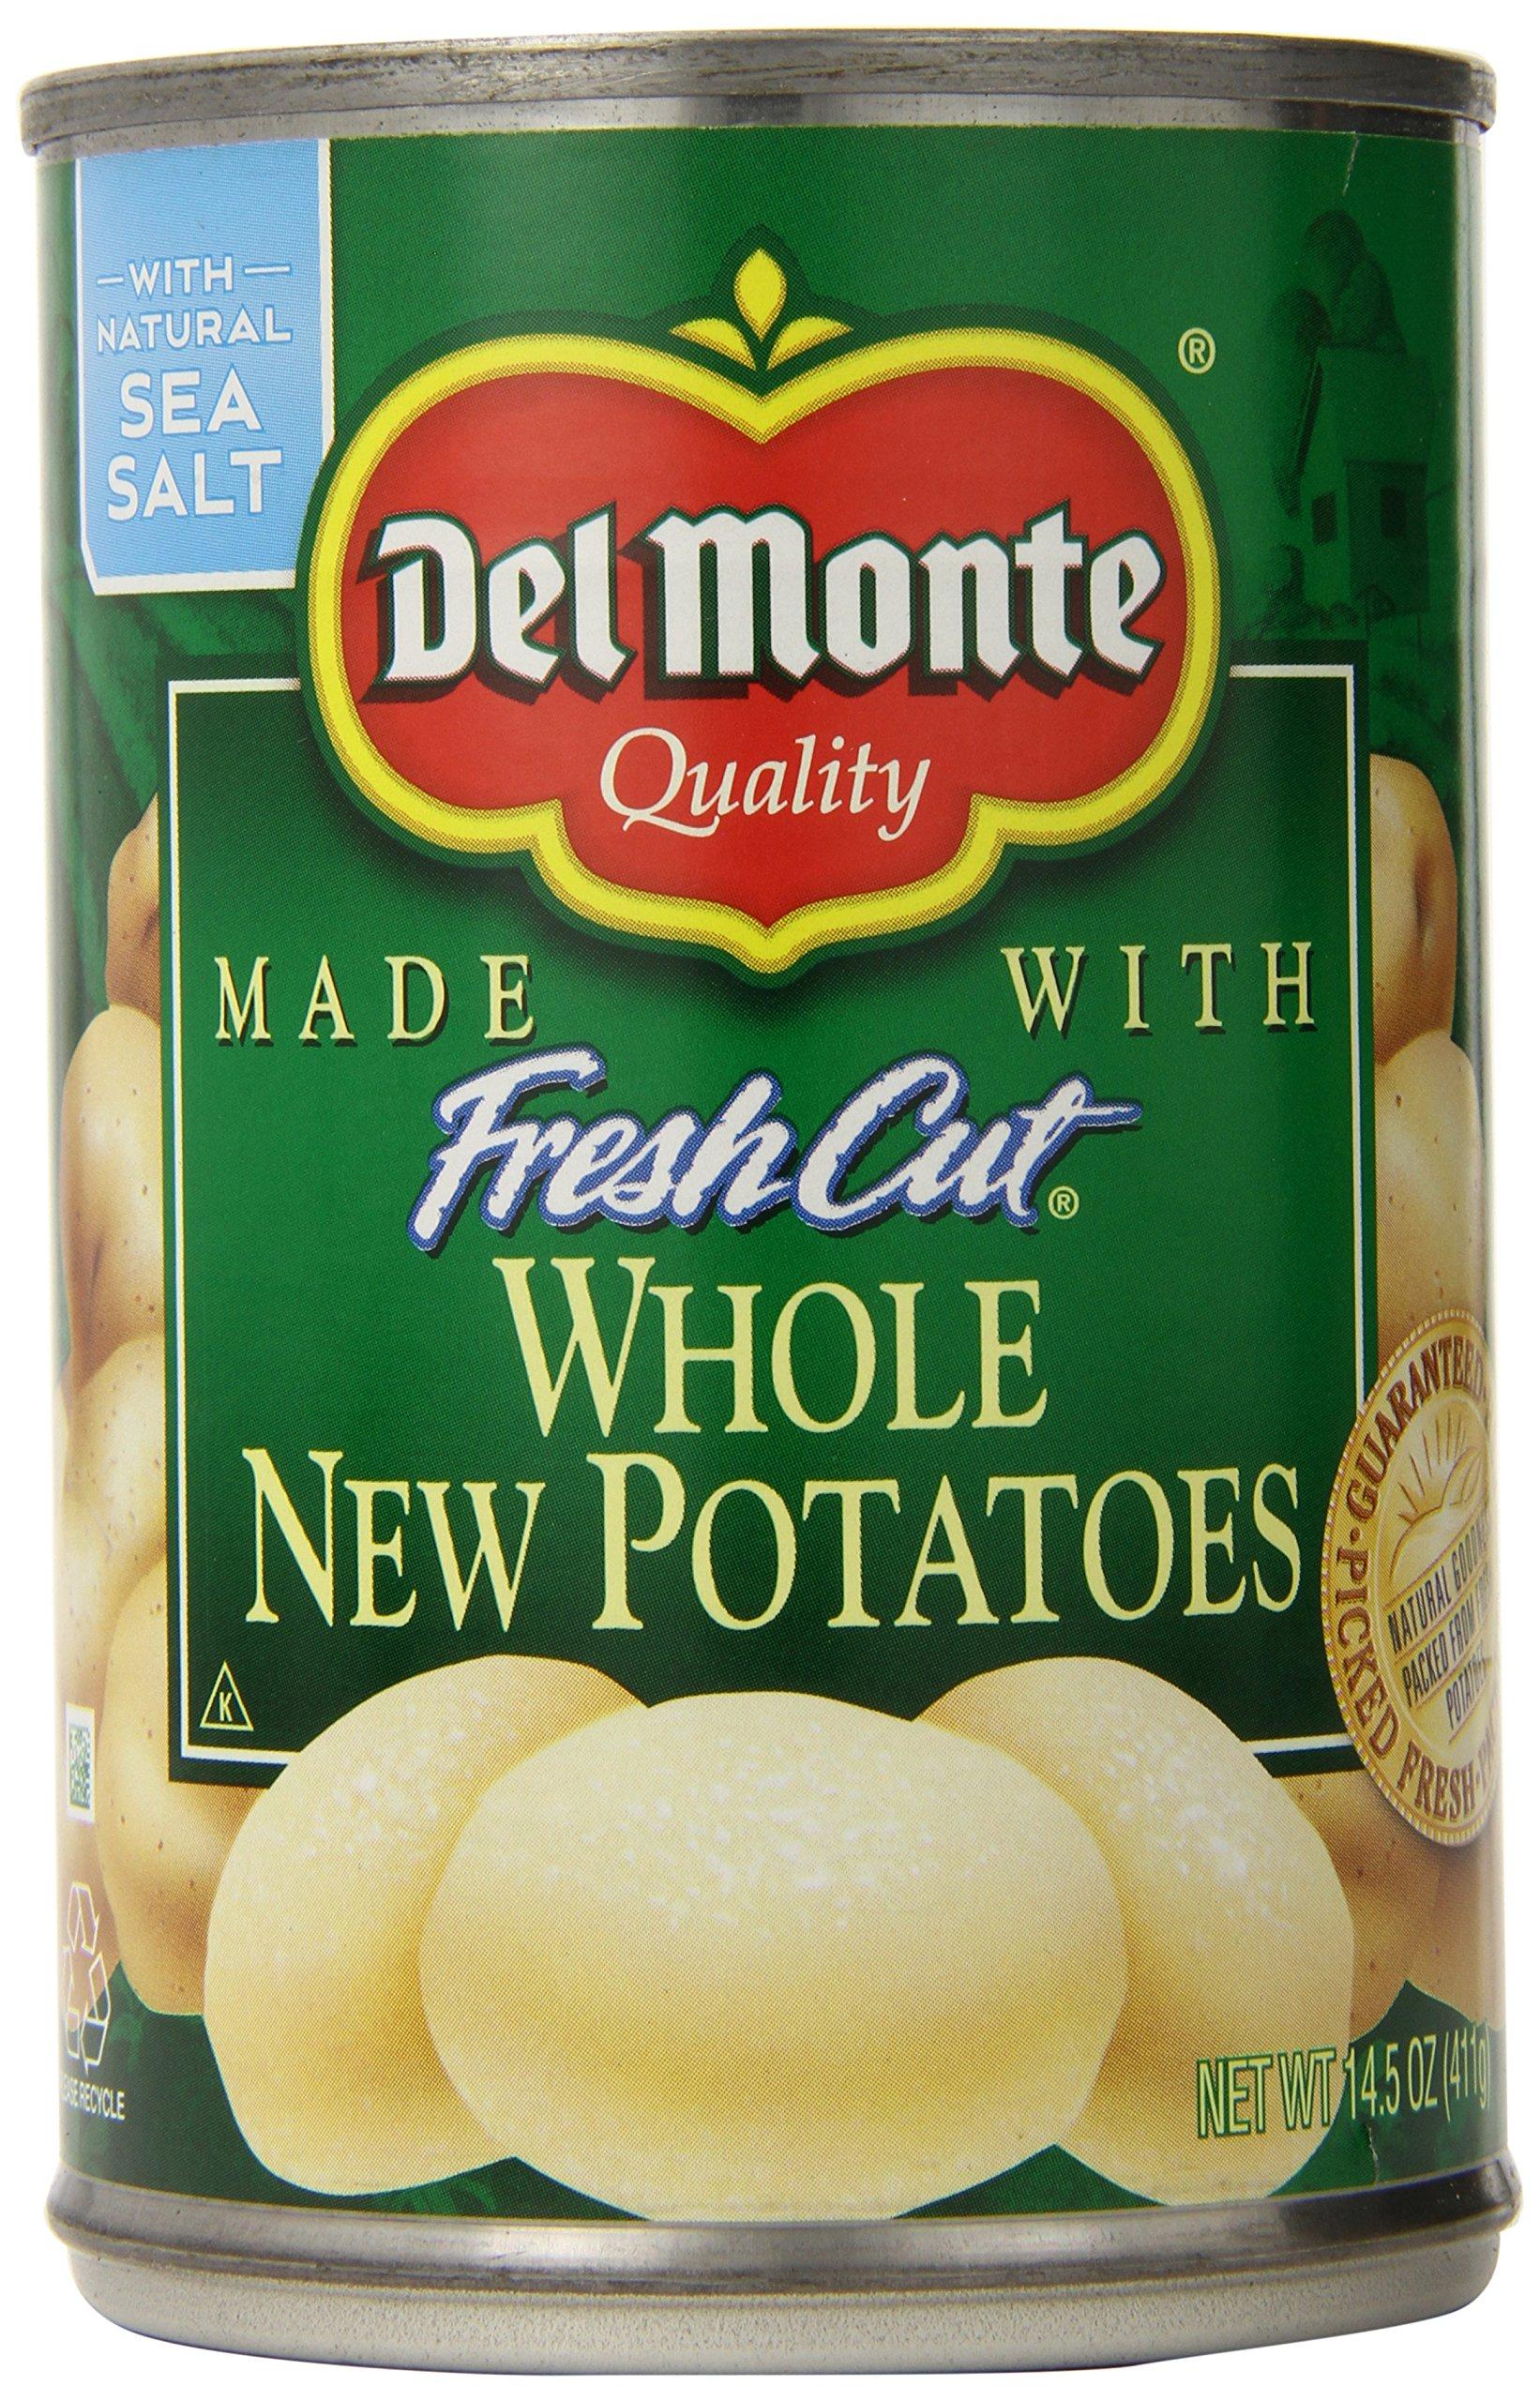 Del Monte Whole New Potatoes, 8 Count by Del Monte